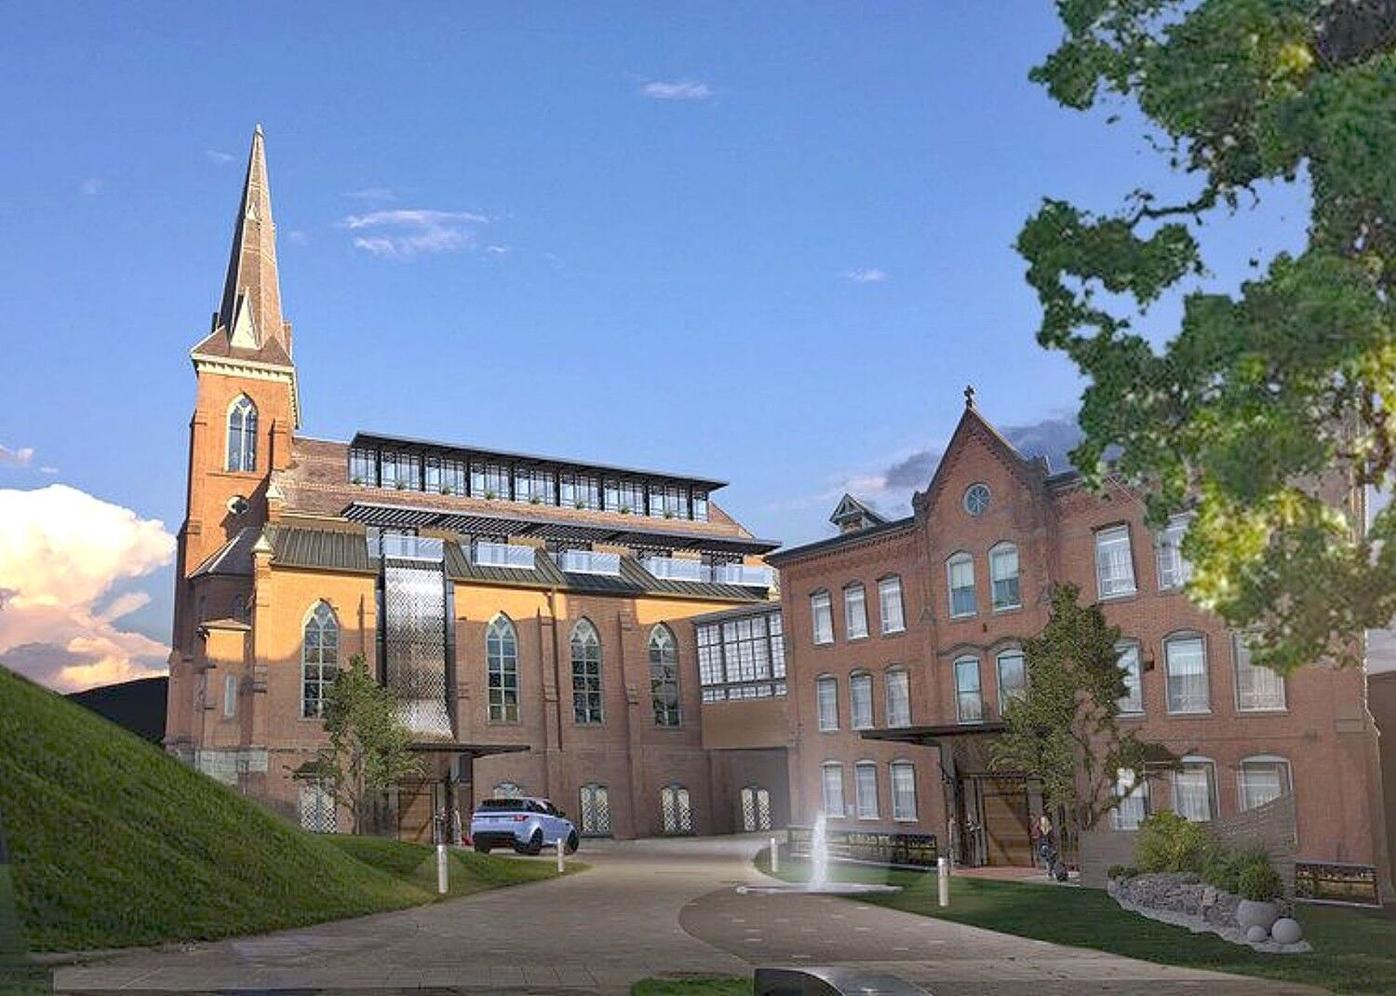 Developer eyes $18.5M hotel project in North Adams